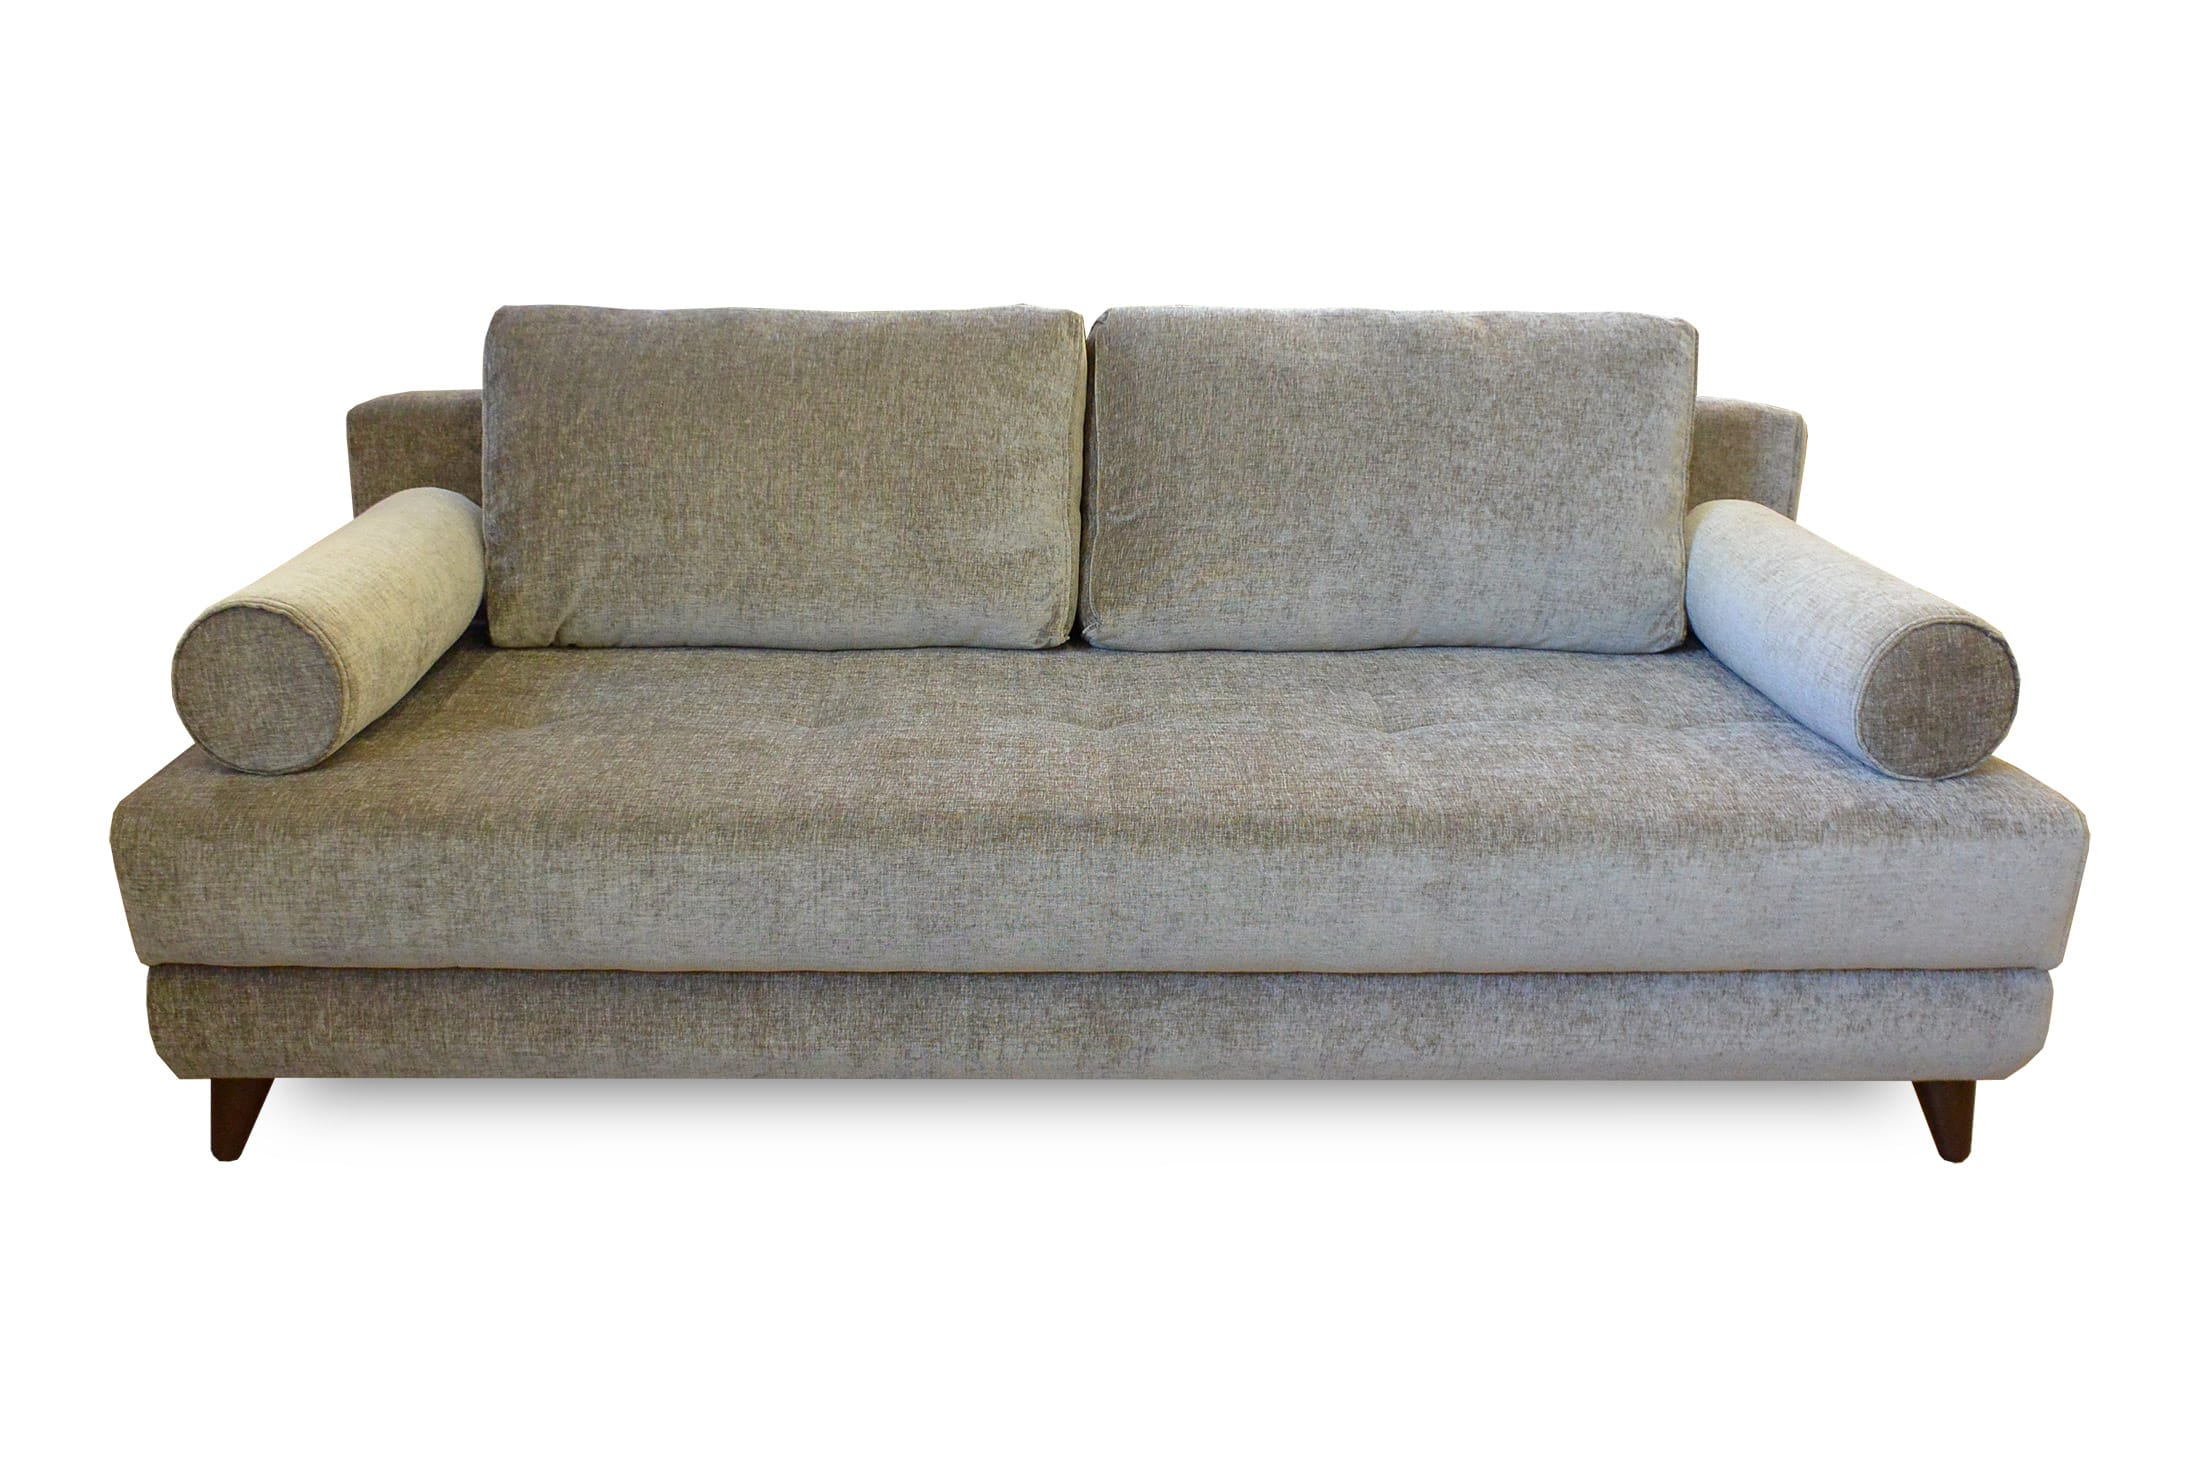 Stella Jennefer Light Brown Convertible Sofa Bed Queen